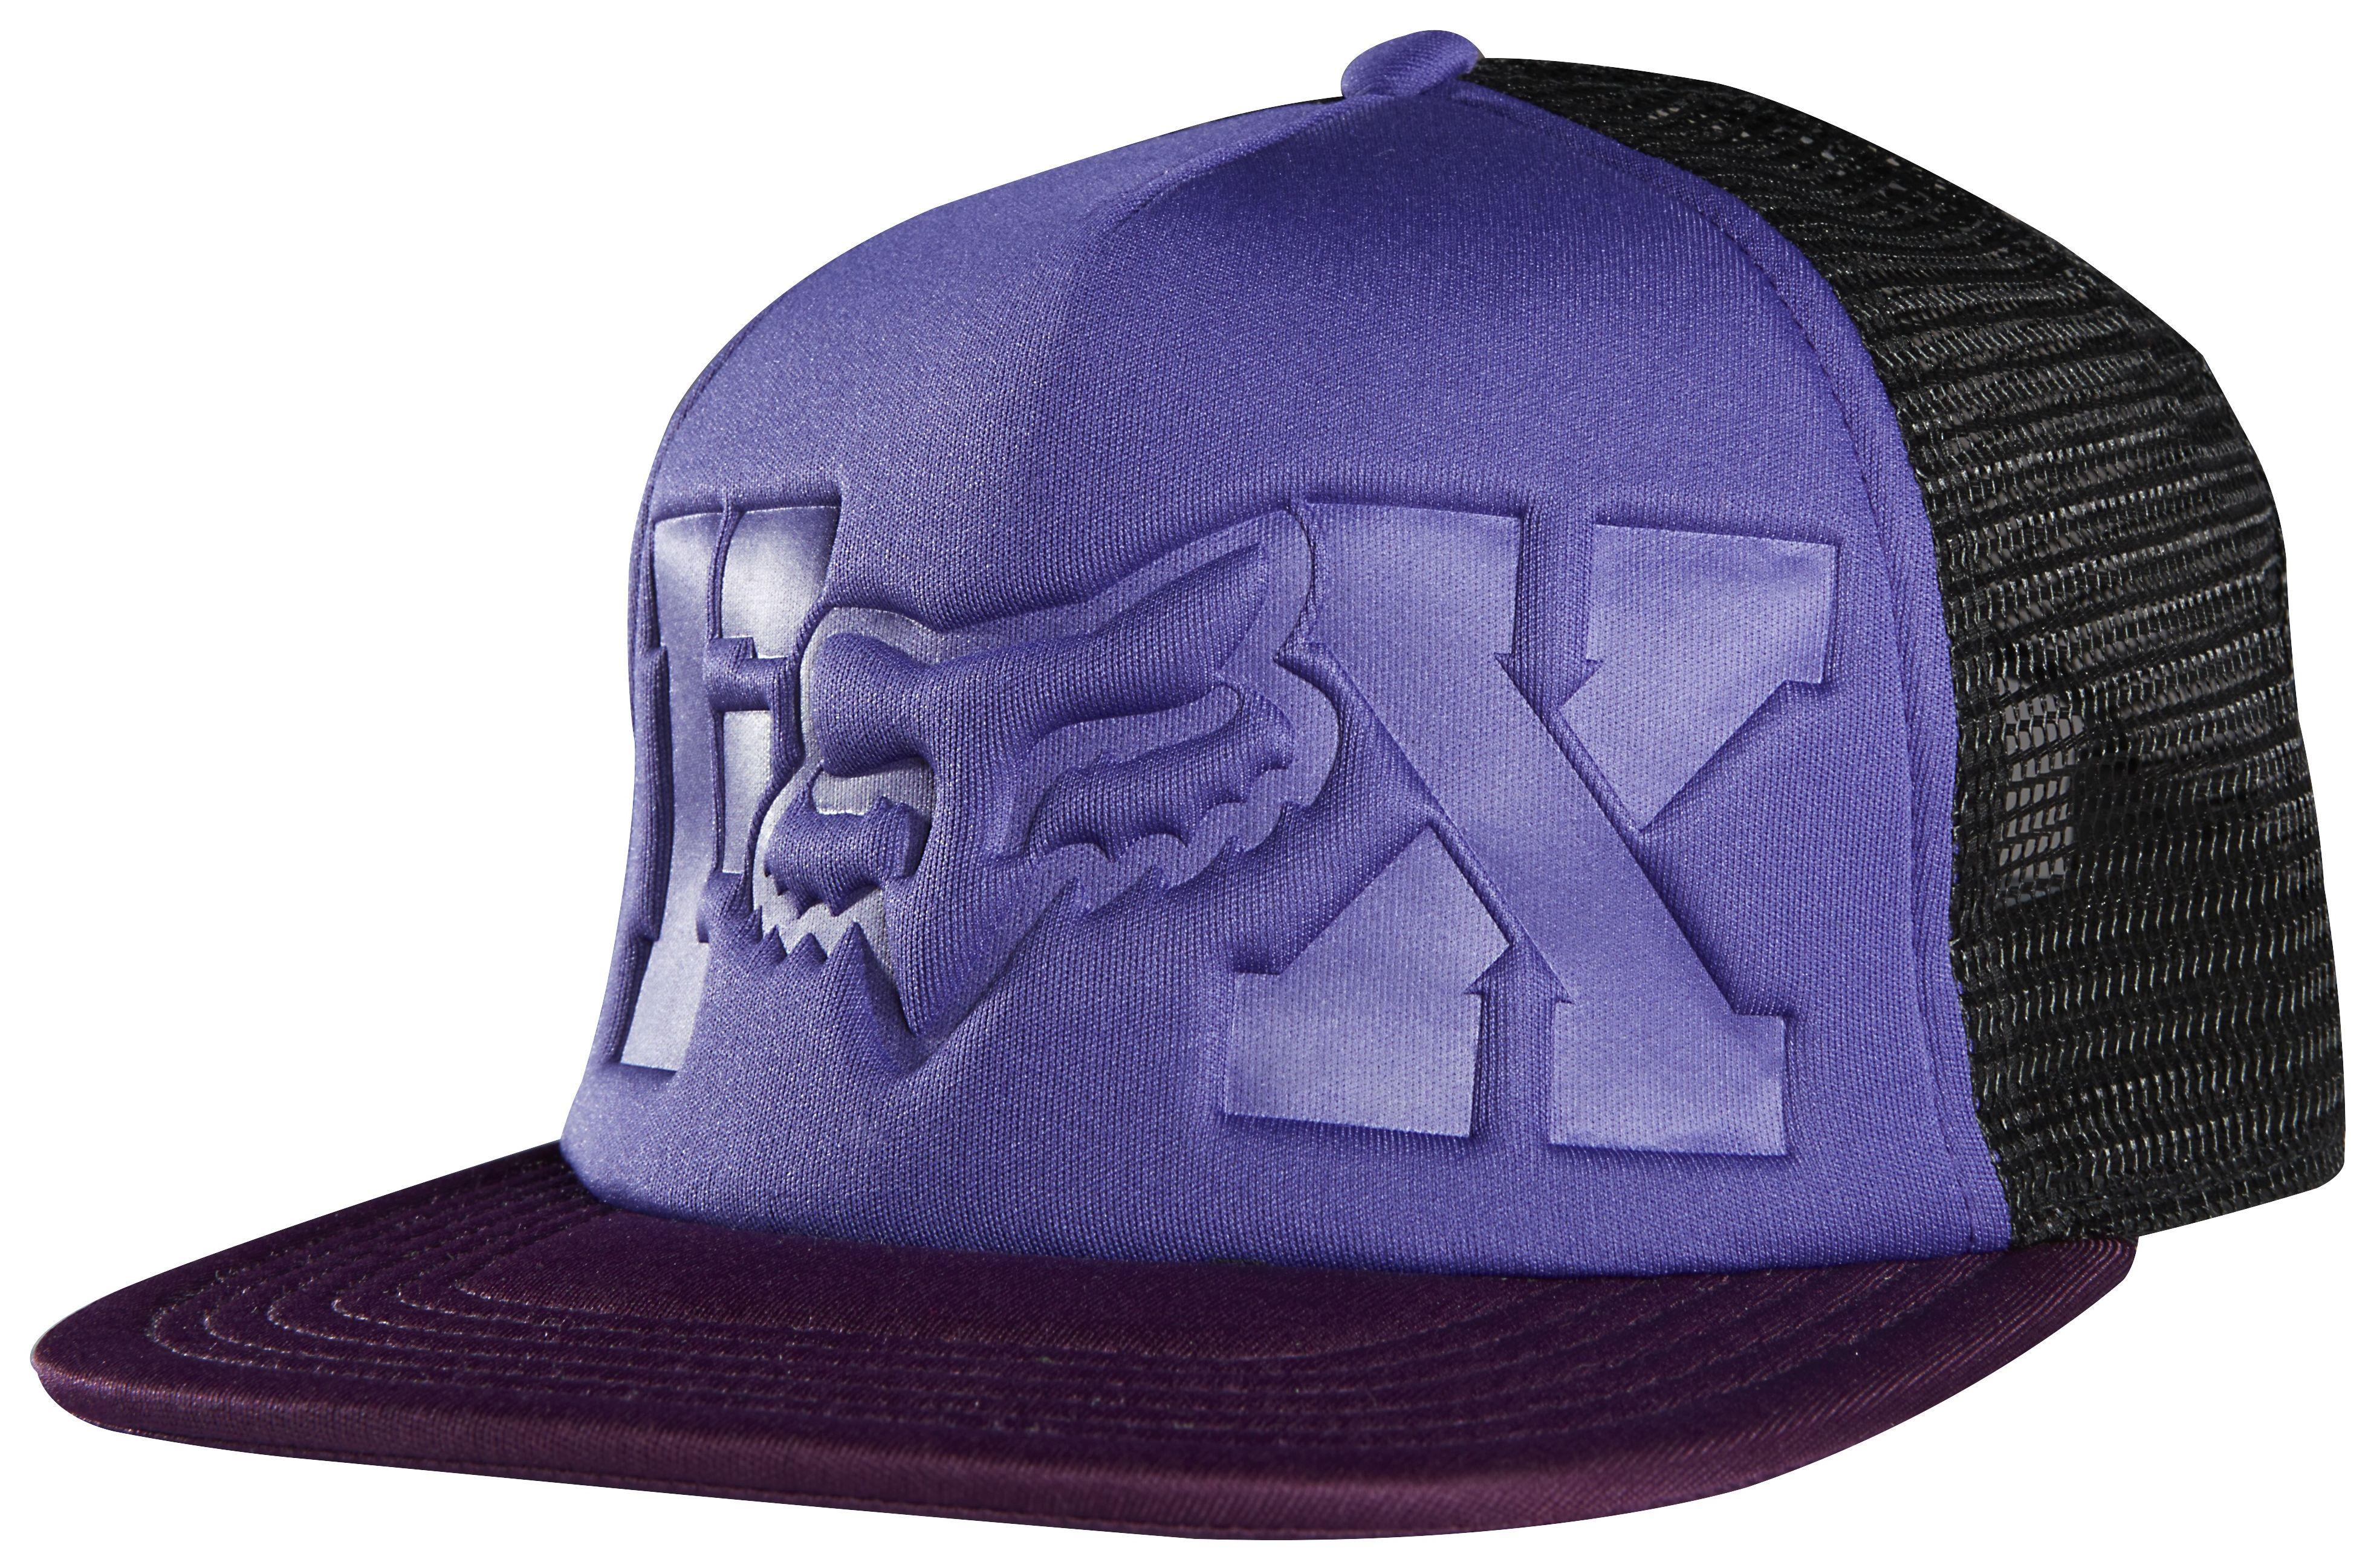 buy popular fe13d 99a59 denmark fox racing shagal flex hat lids b0589 9e6b3  order spain purple fox  racing hat 92624 14772 a3da8 773a8